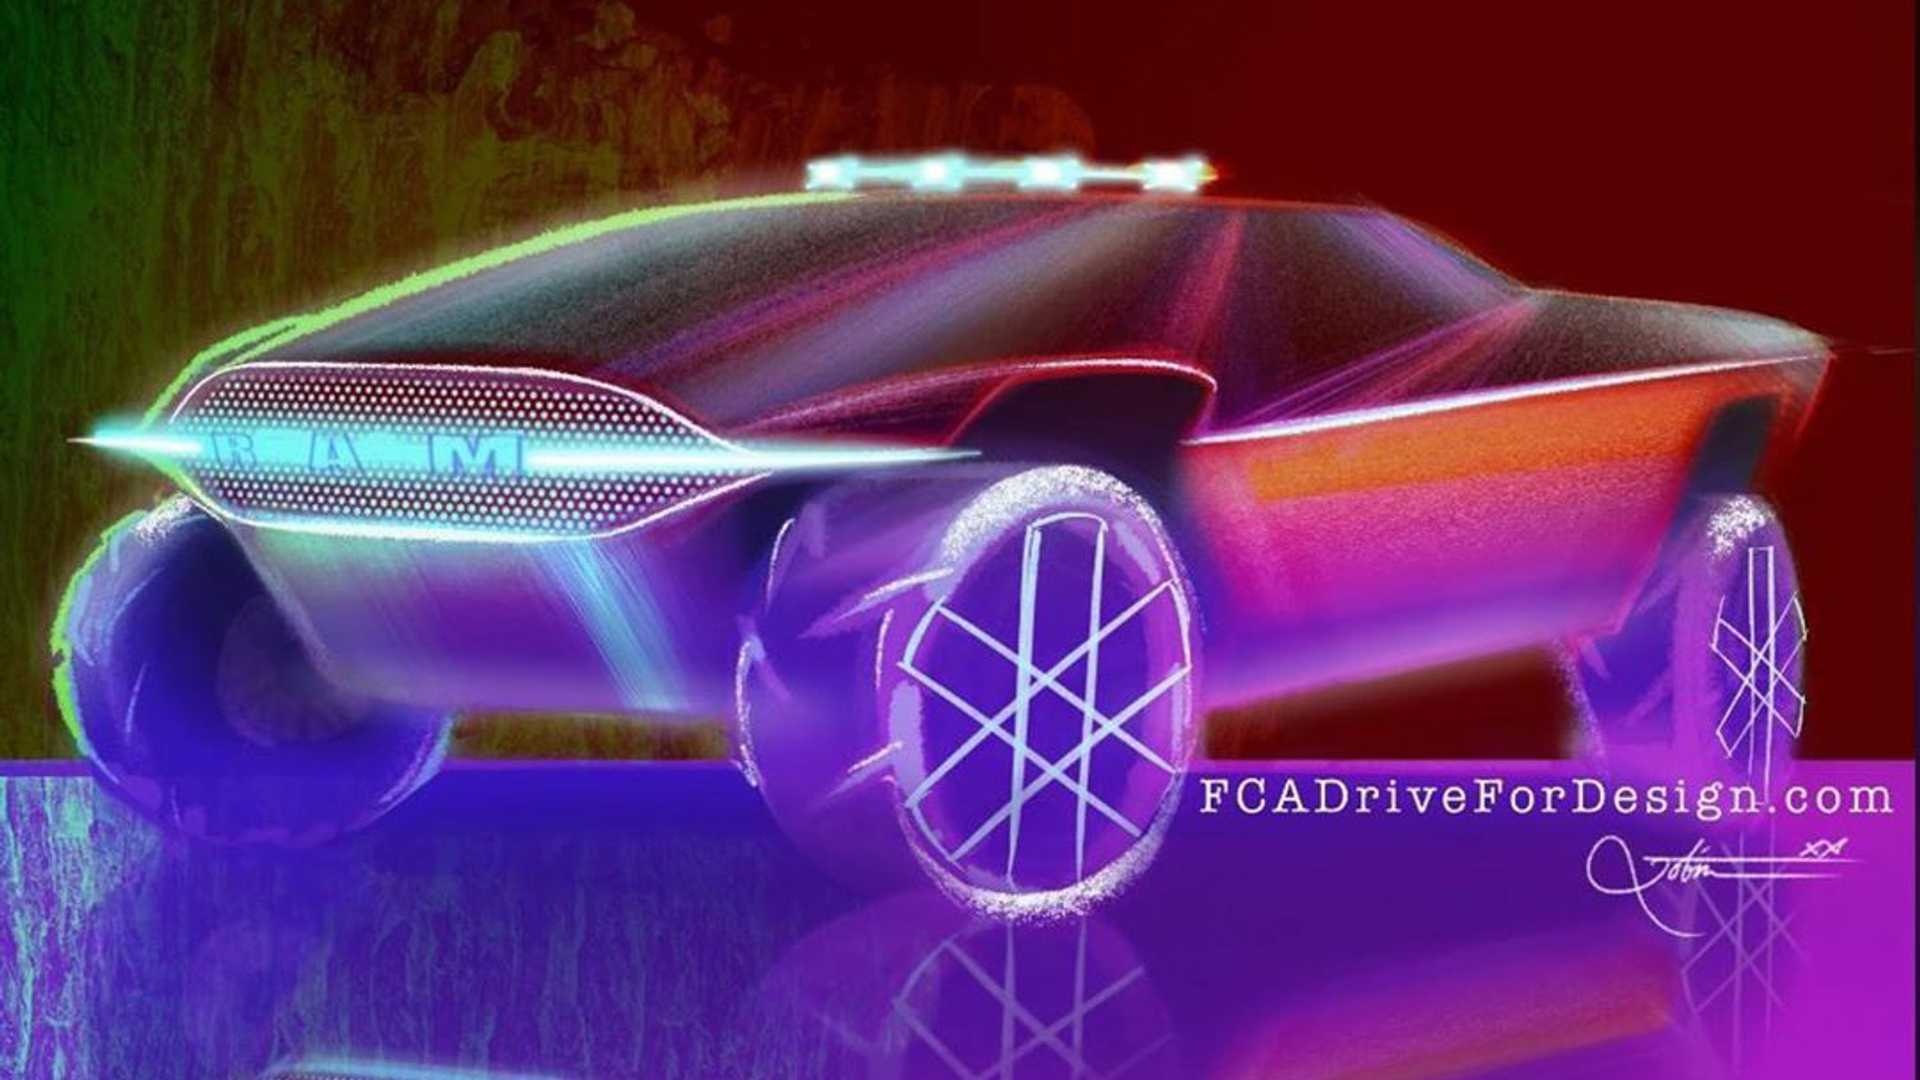 fca-drive-for-design-ram-sketch-battle-5